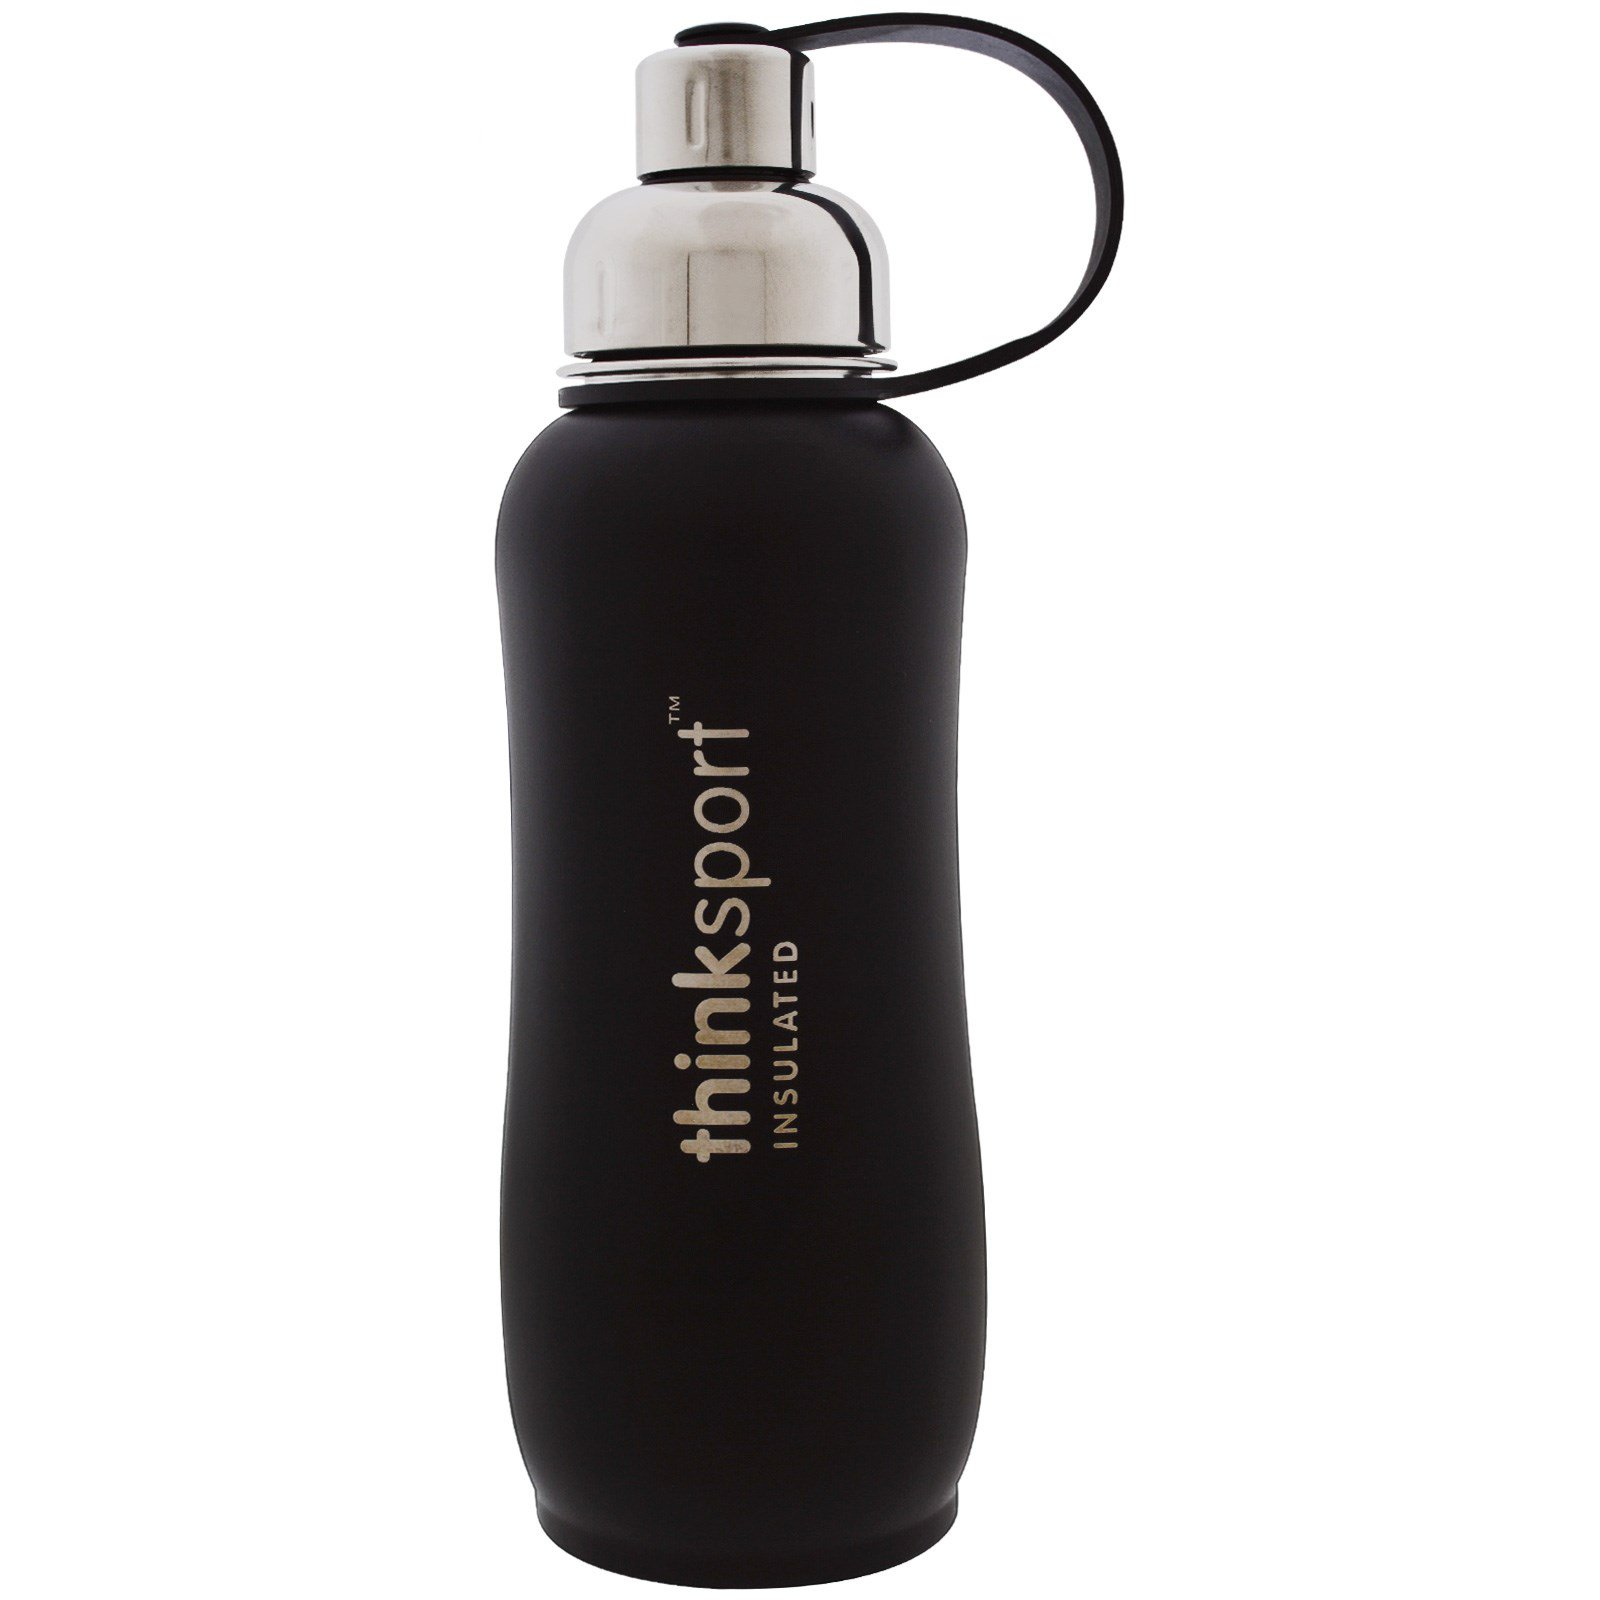 Think Thinksport Insulated Sports Bottle Black